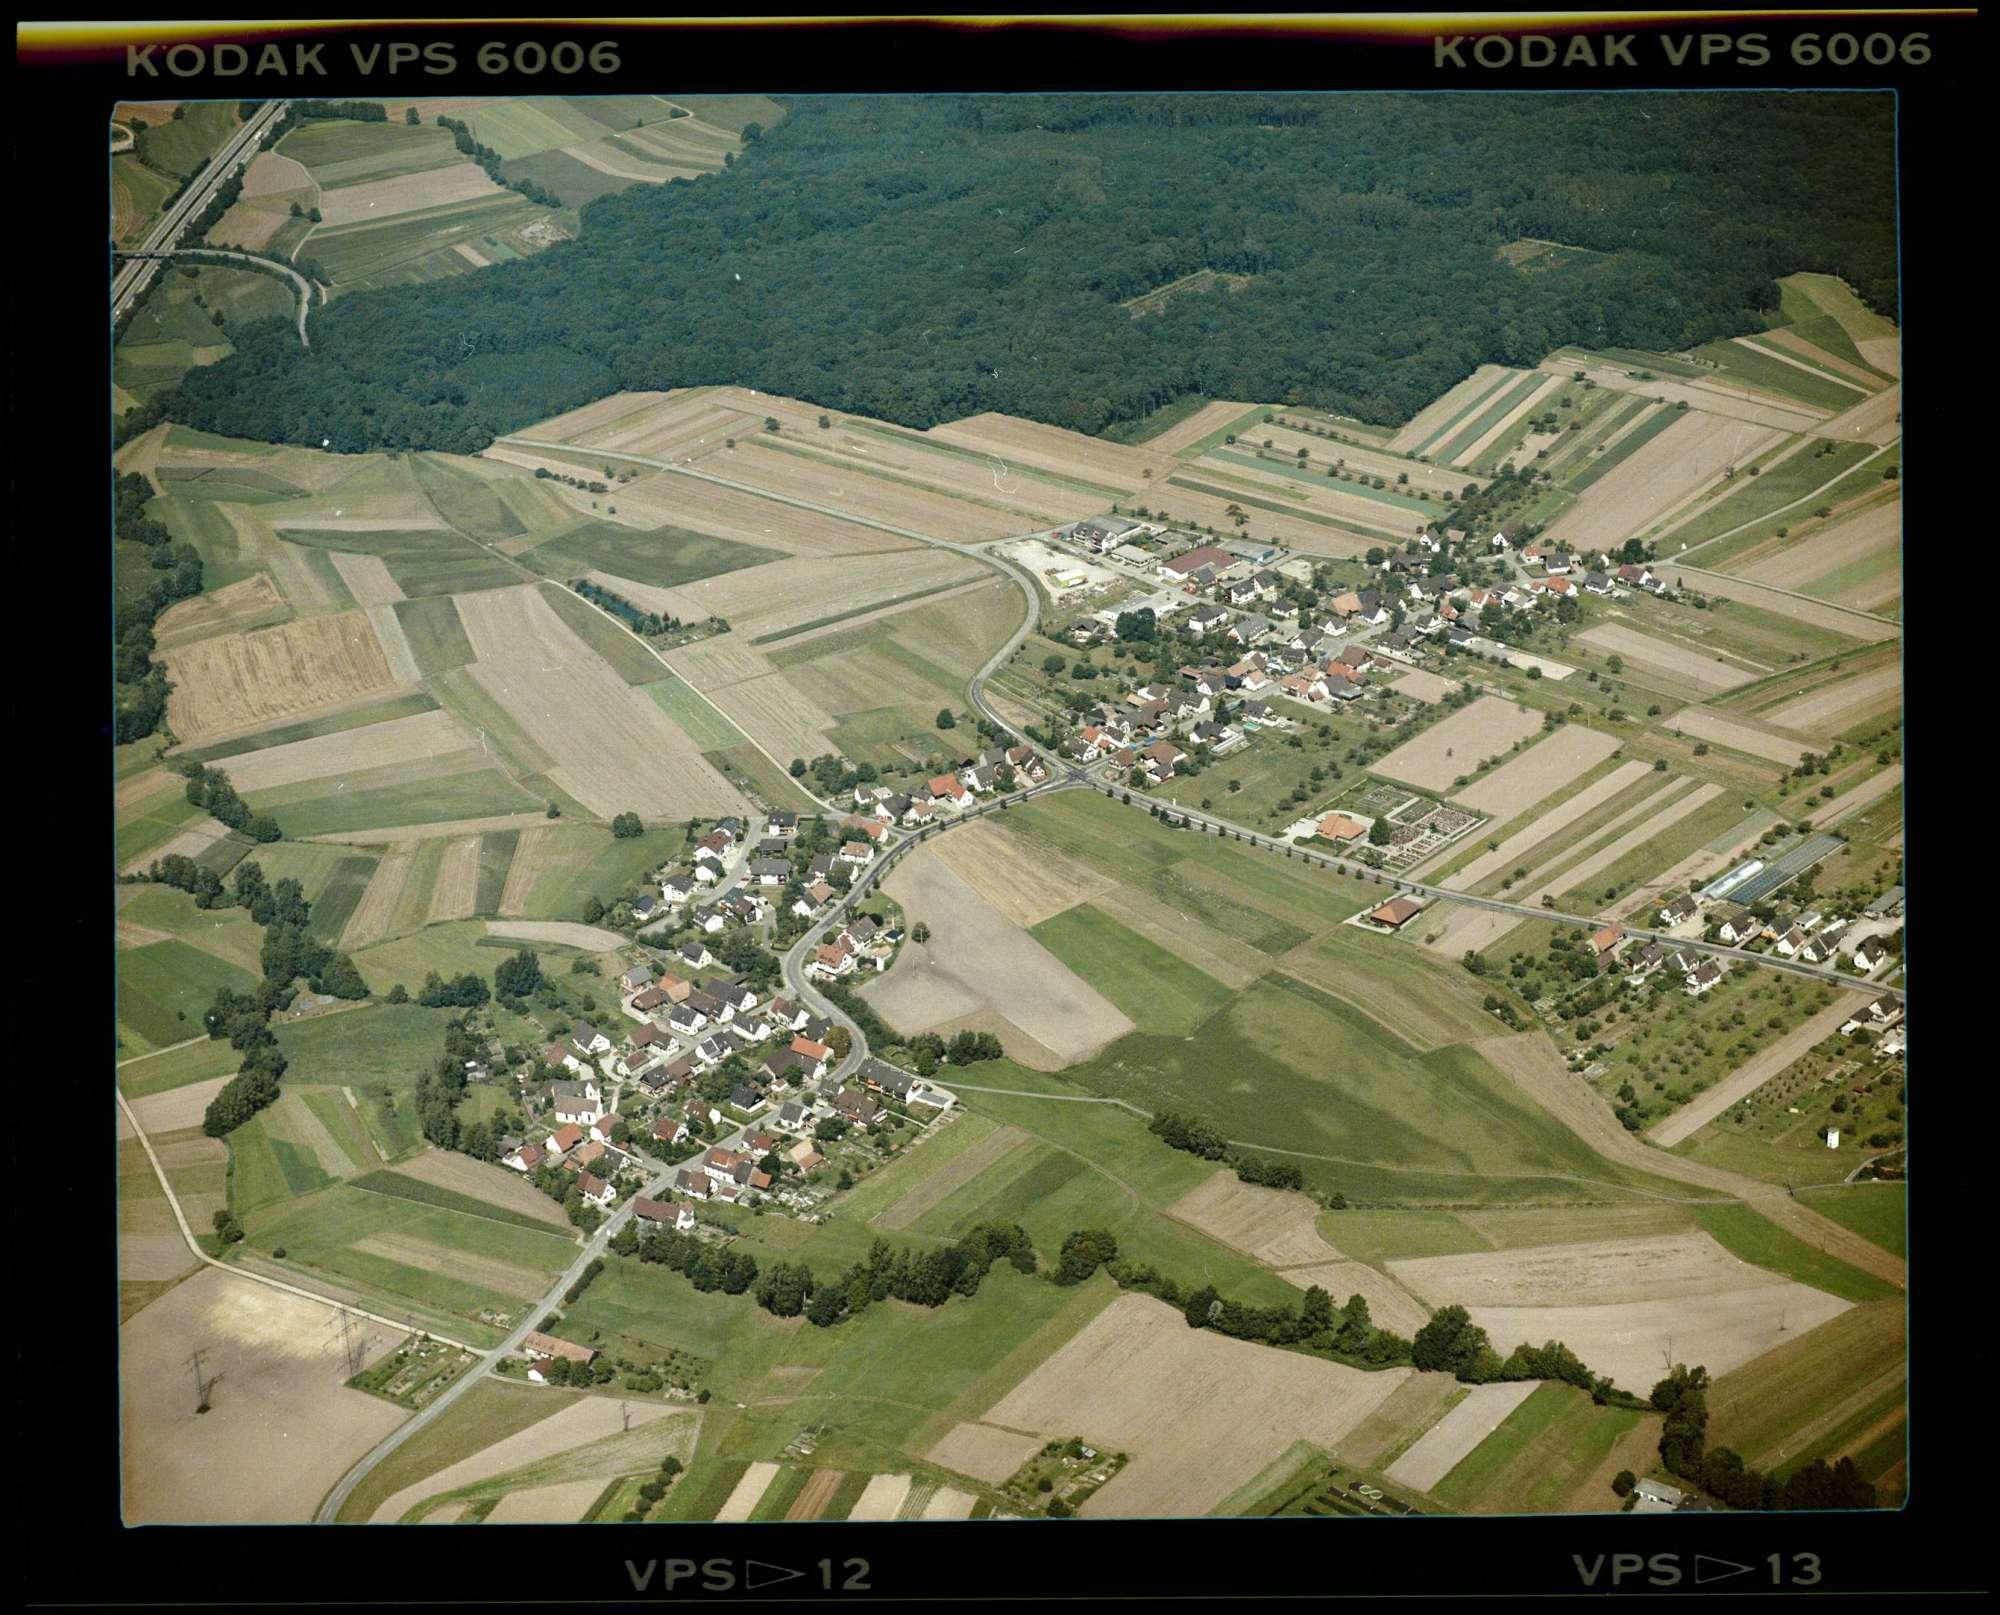 Unterreute, Luftbild, Bild 1